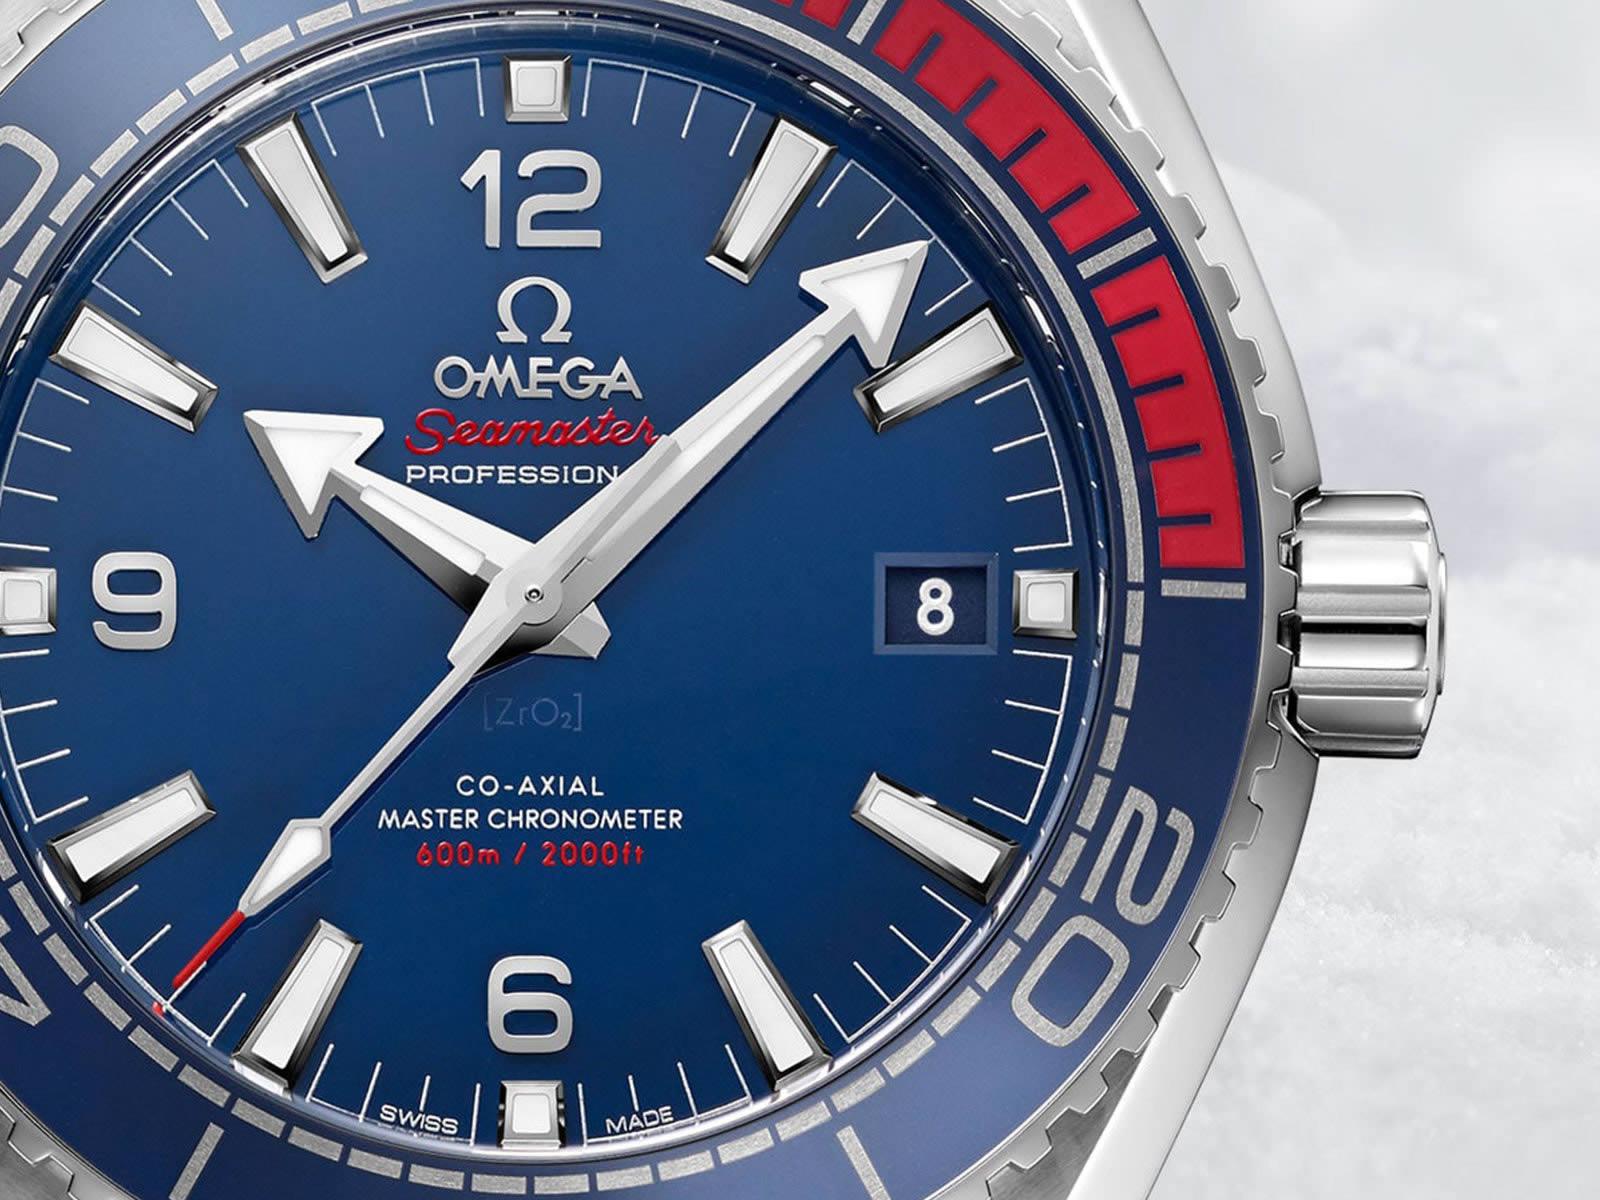 52232442103001-Omega-Seamaster-Aqua-Terra-Pyeongchang-2018-Limited-Edition-2.jpg